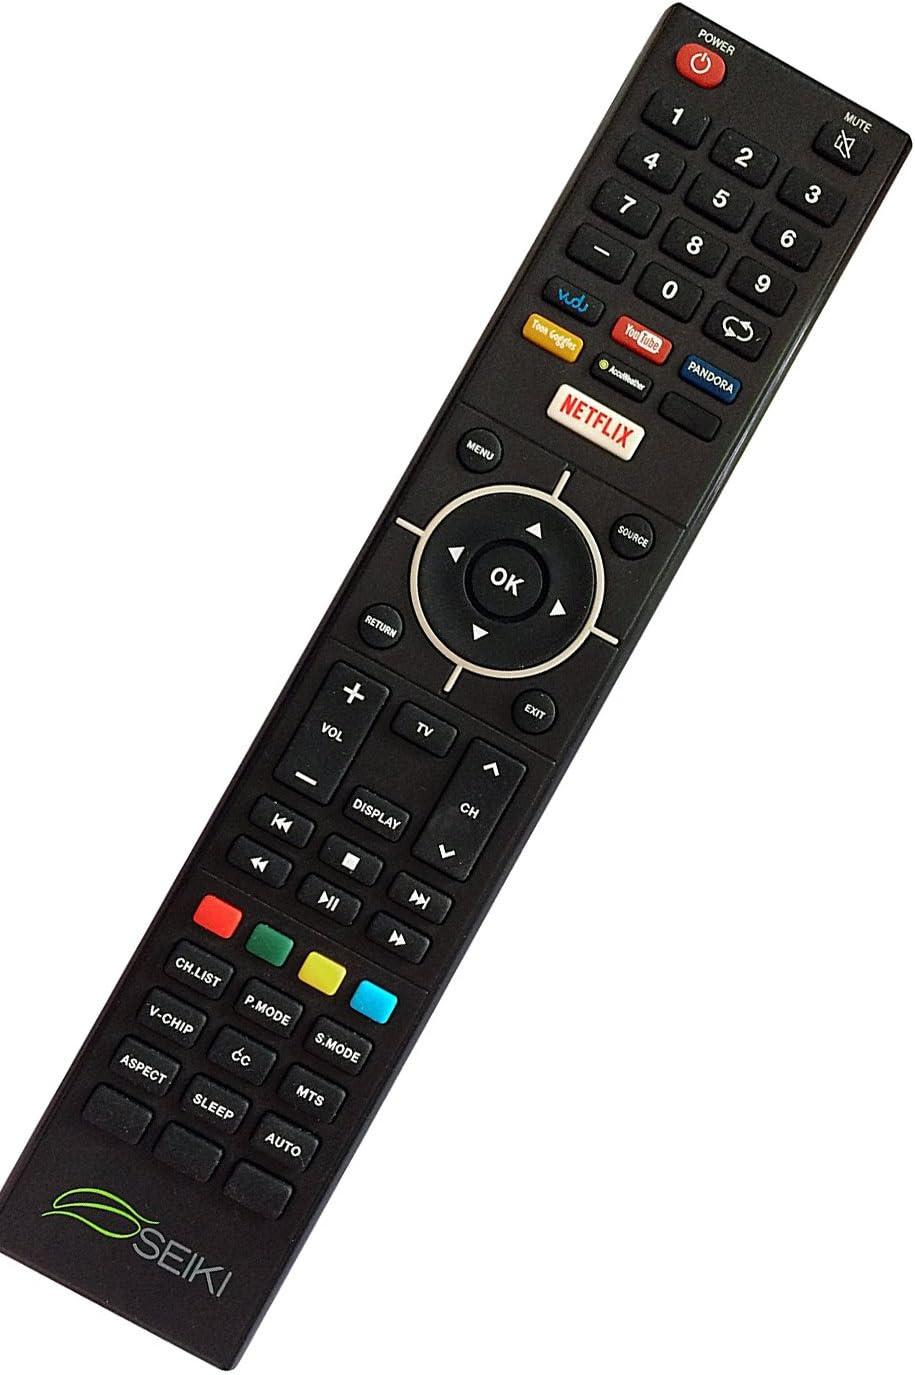 Nueva Seiki Seiki Smart TV Mando a Distancia para SEIKI se32hy19t Smart TV Remoto con Vudu Netflix Youtube Pandora Teclas: Amazon.es: Electrónica